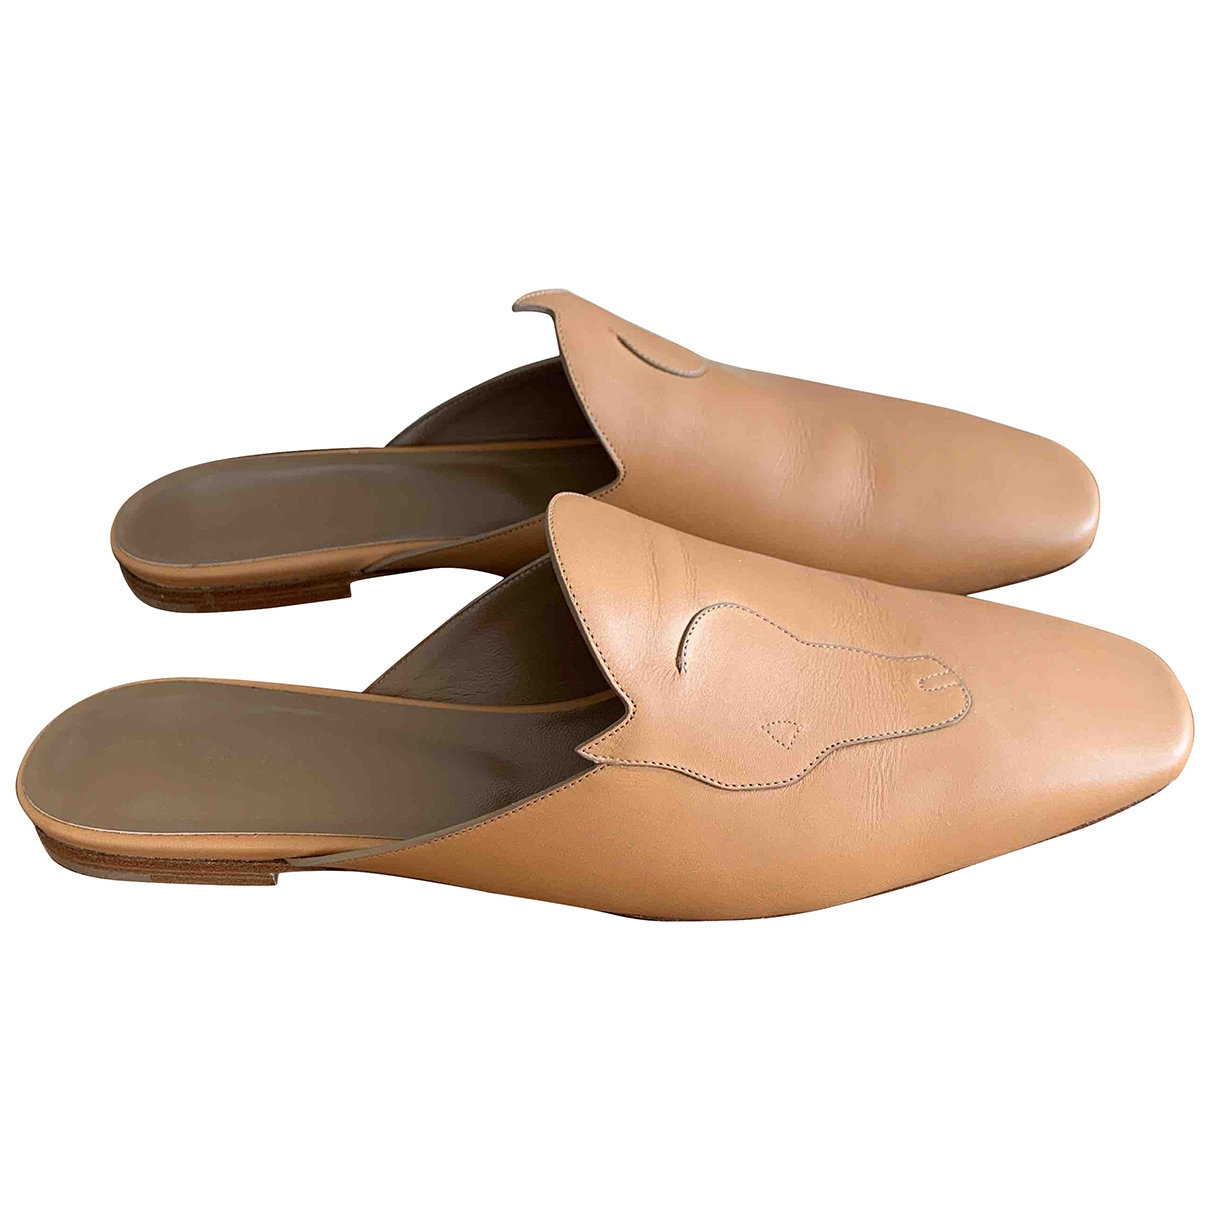 Hermès \N Beige Leather Flats for Women 40 EU